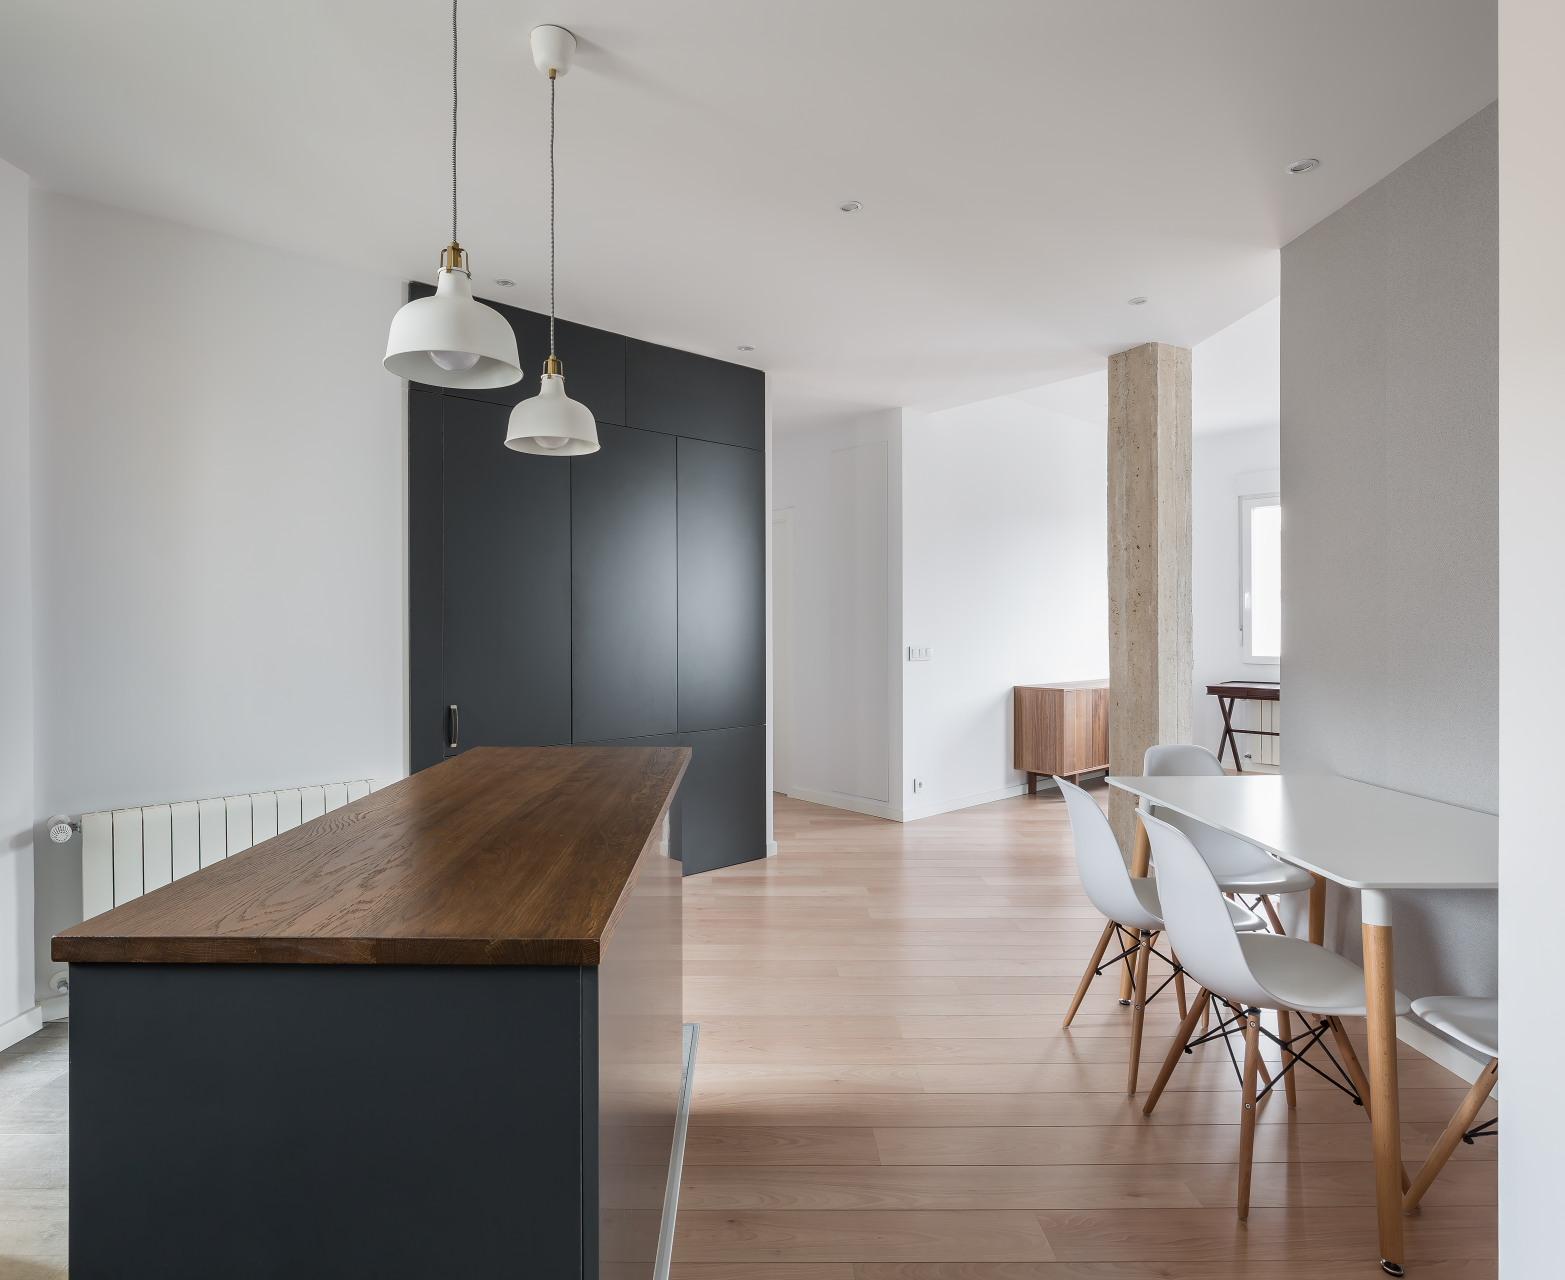 fotografia-arquitectura-interiorismo-valencia-german-cabo-lliberos-alboraya (1)